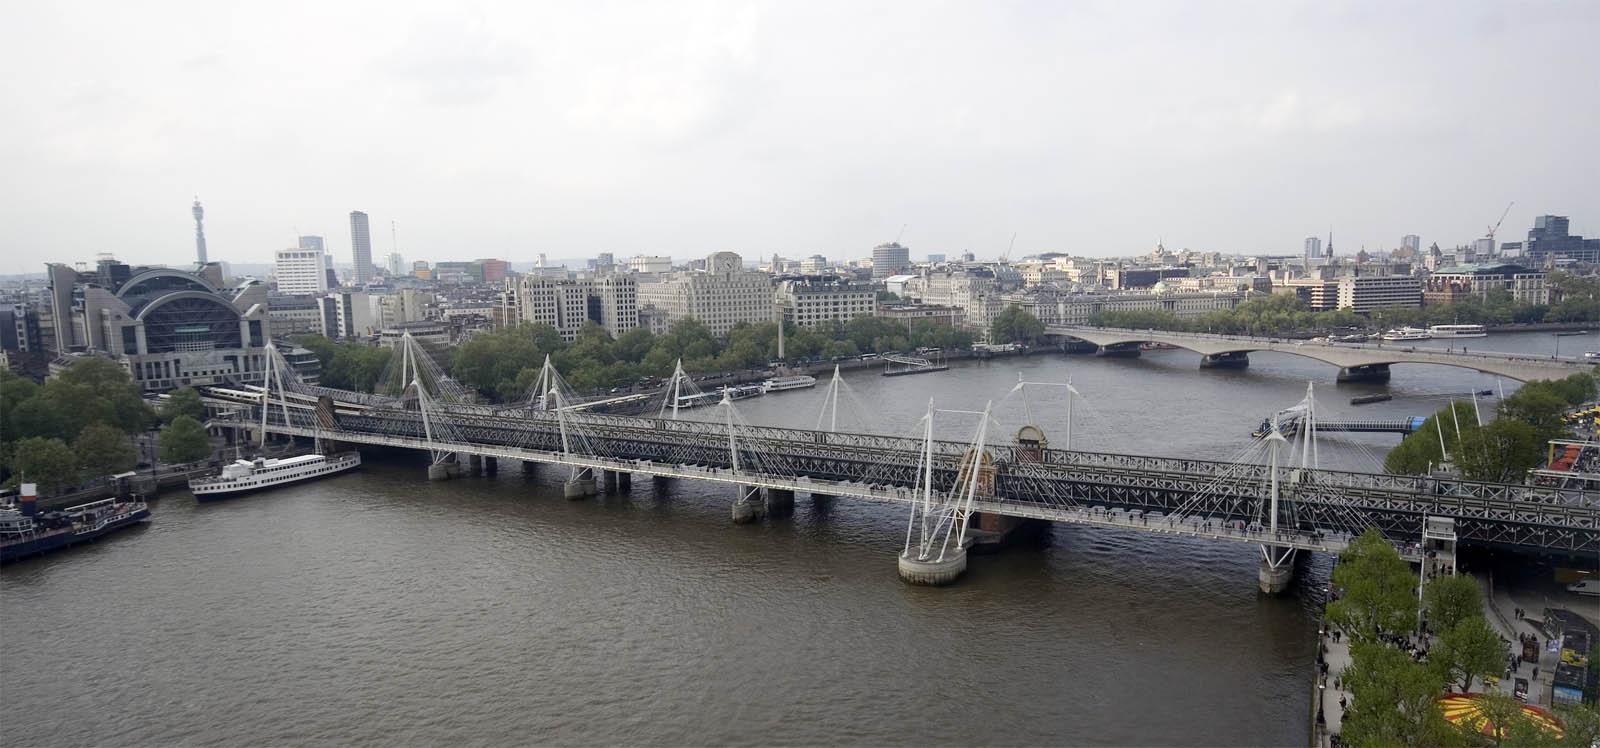 Charing Cross Bridge (London)